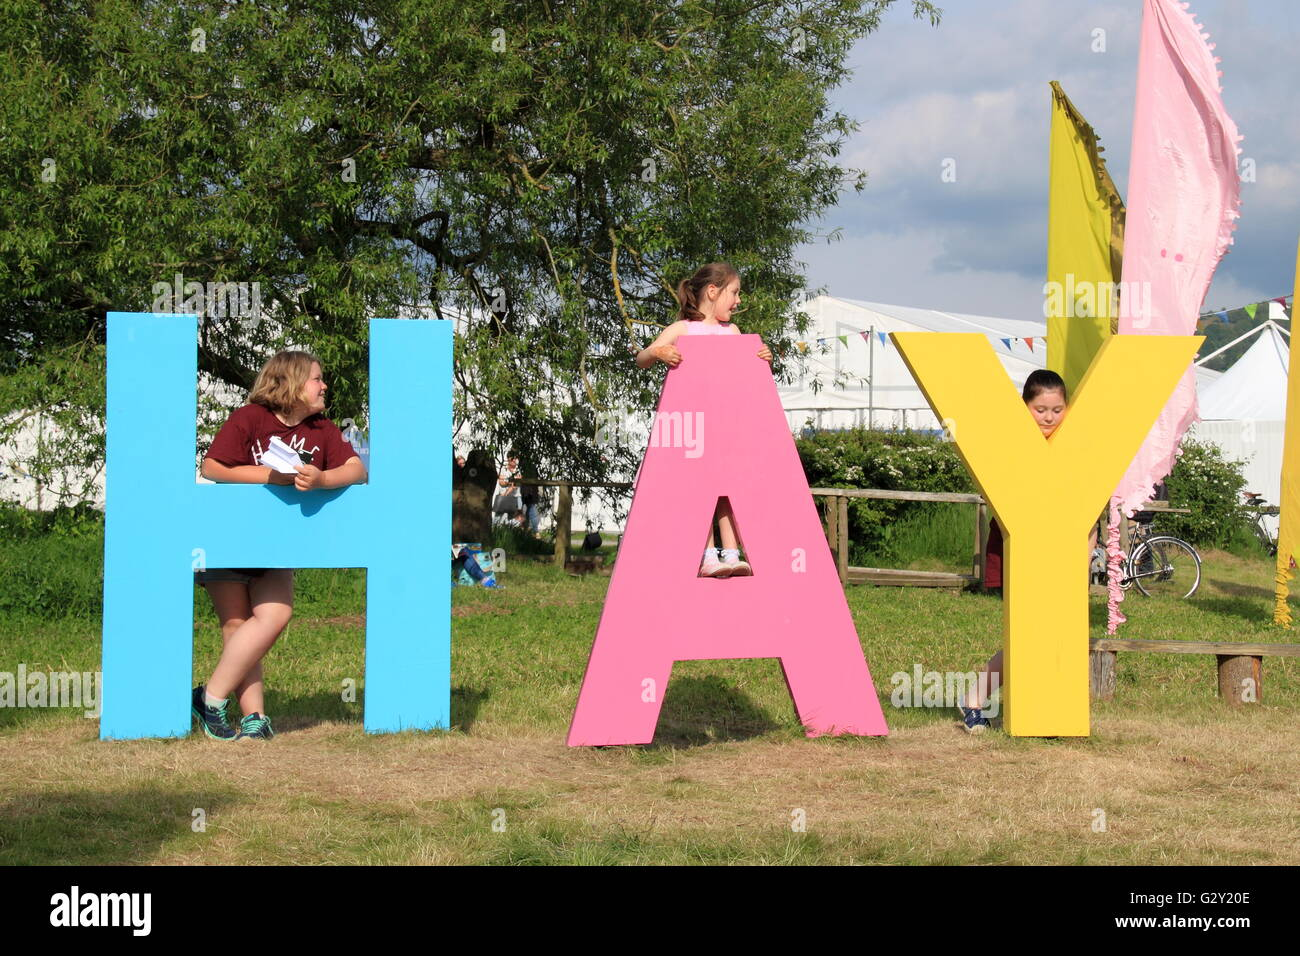 Hay Festival 2016 entrance, Hay-on-Wye, Brecknockshire, Powys, Wales, Great Britain, United Kingdom, UK, Europe - Stock Image